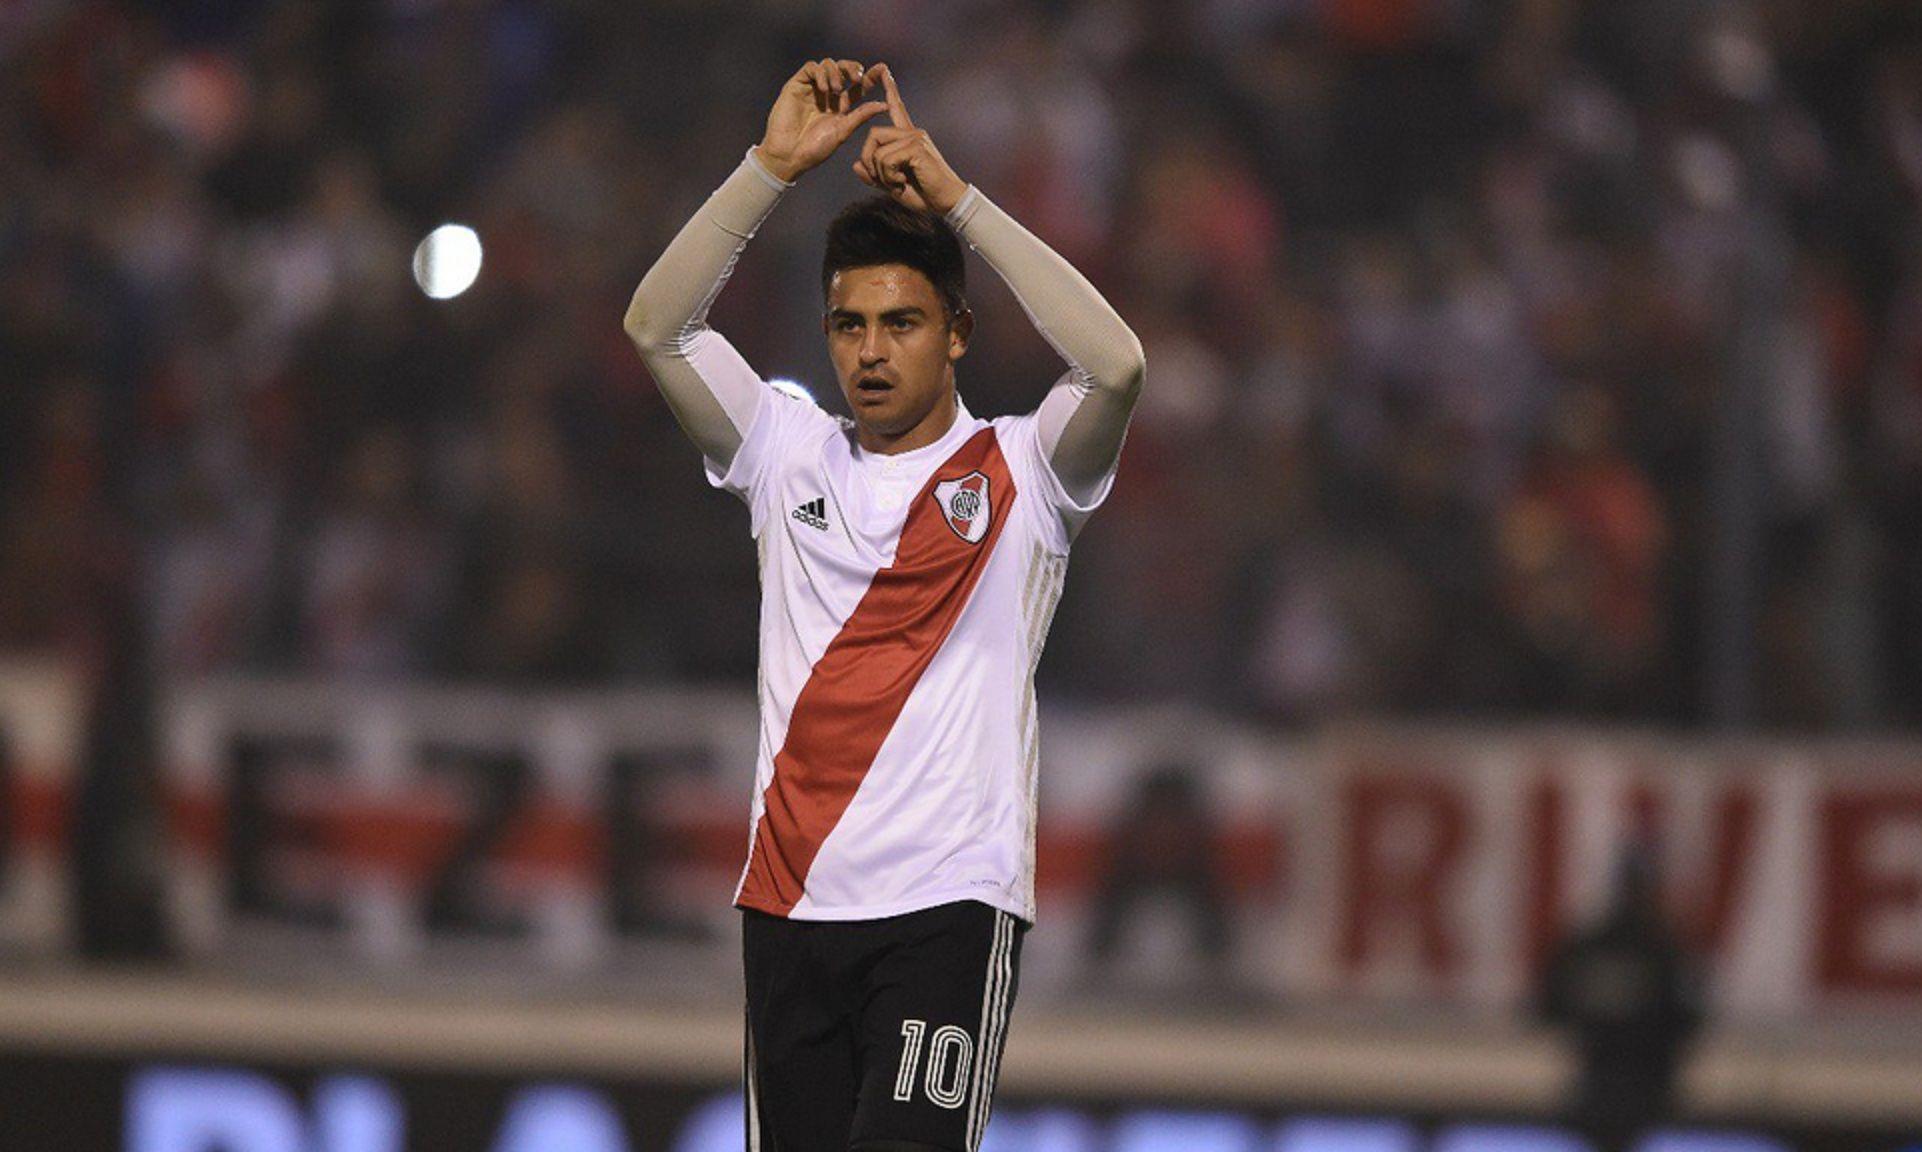 Pity Martínez festeja su gol